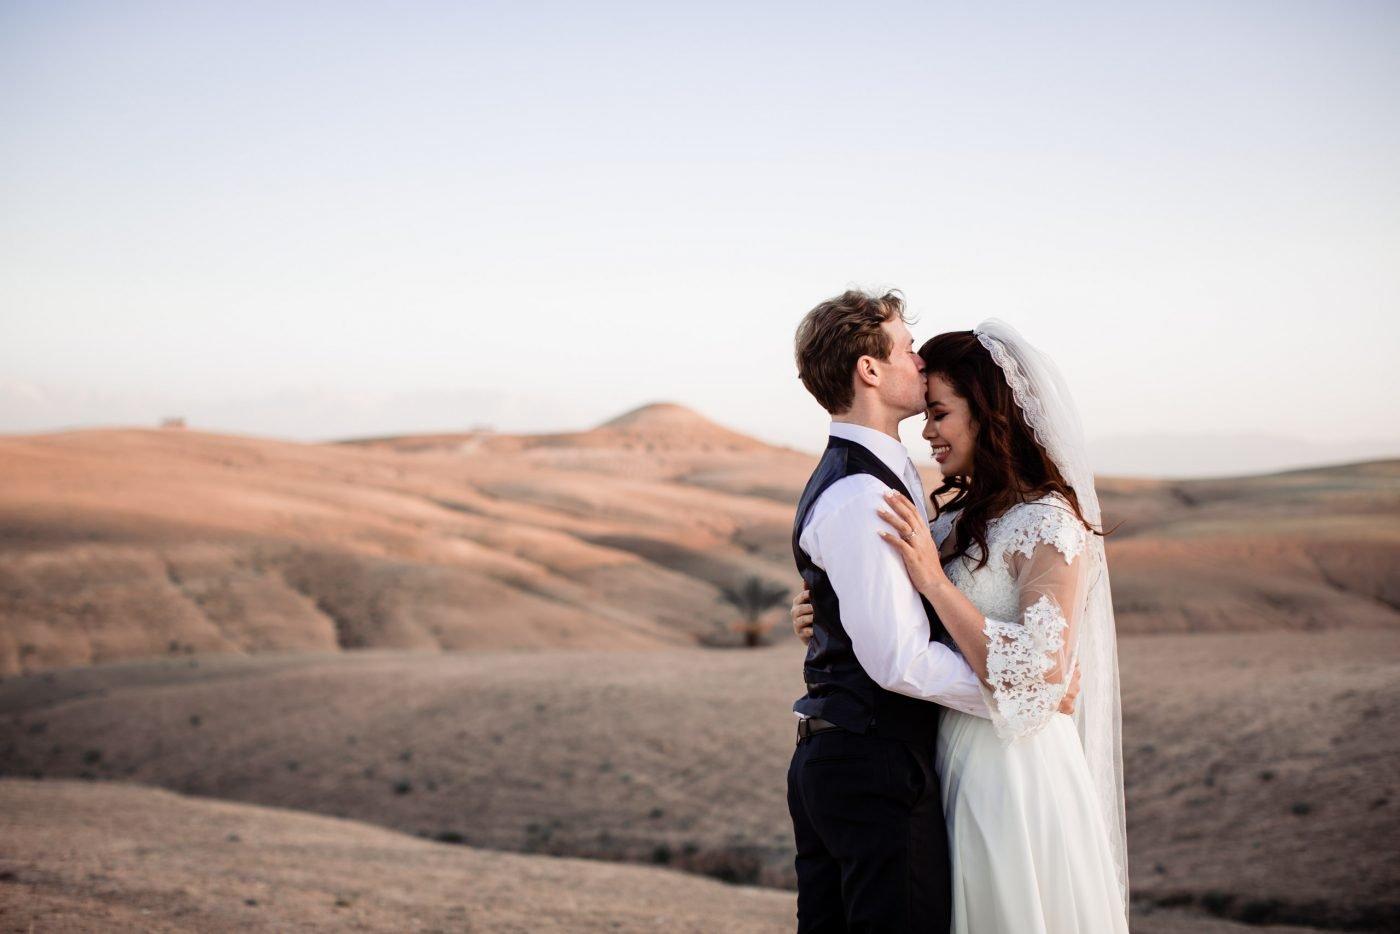 Wedding photos in Agafay desert in Marrakech